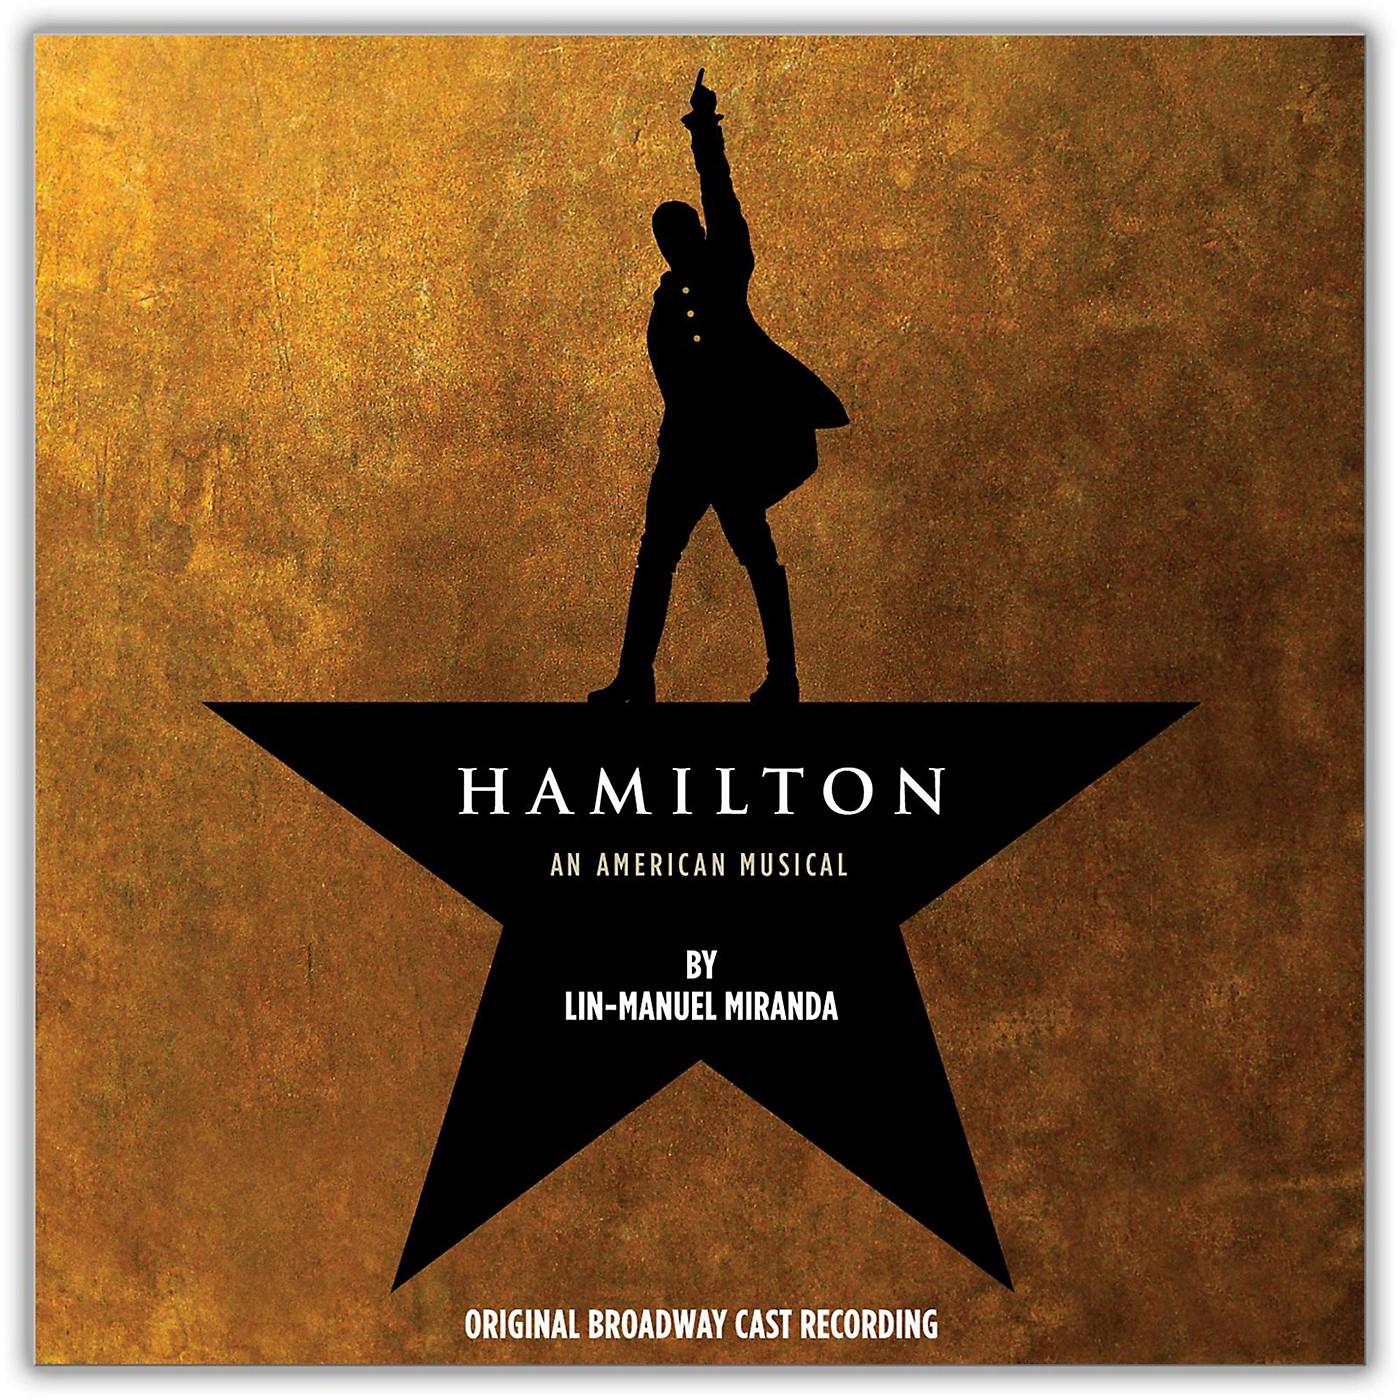 WEA Various Artists - Hamilton (Original Broadway Cast Recording) (Explicit) 4LP Vinyl thumbnail